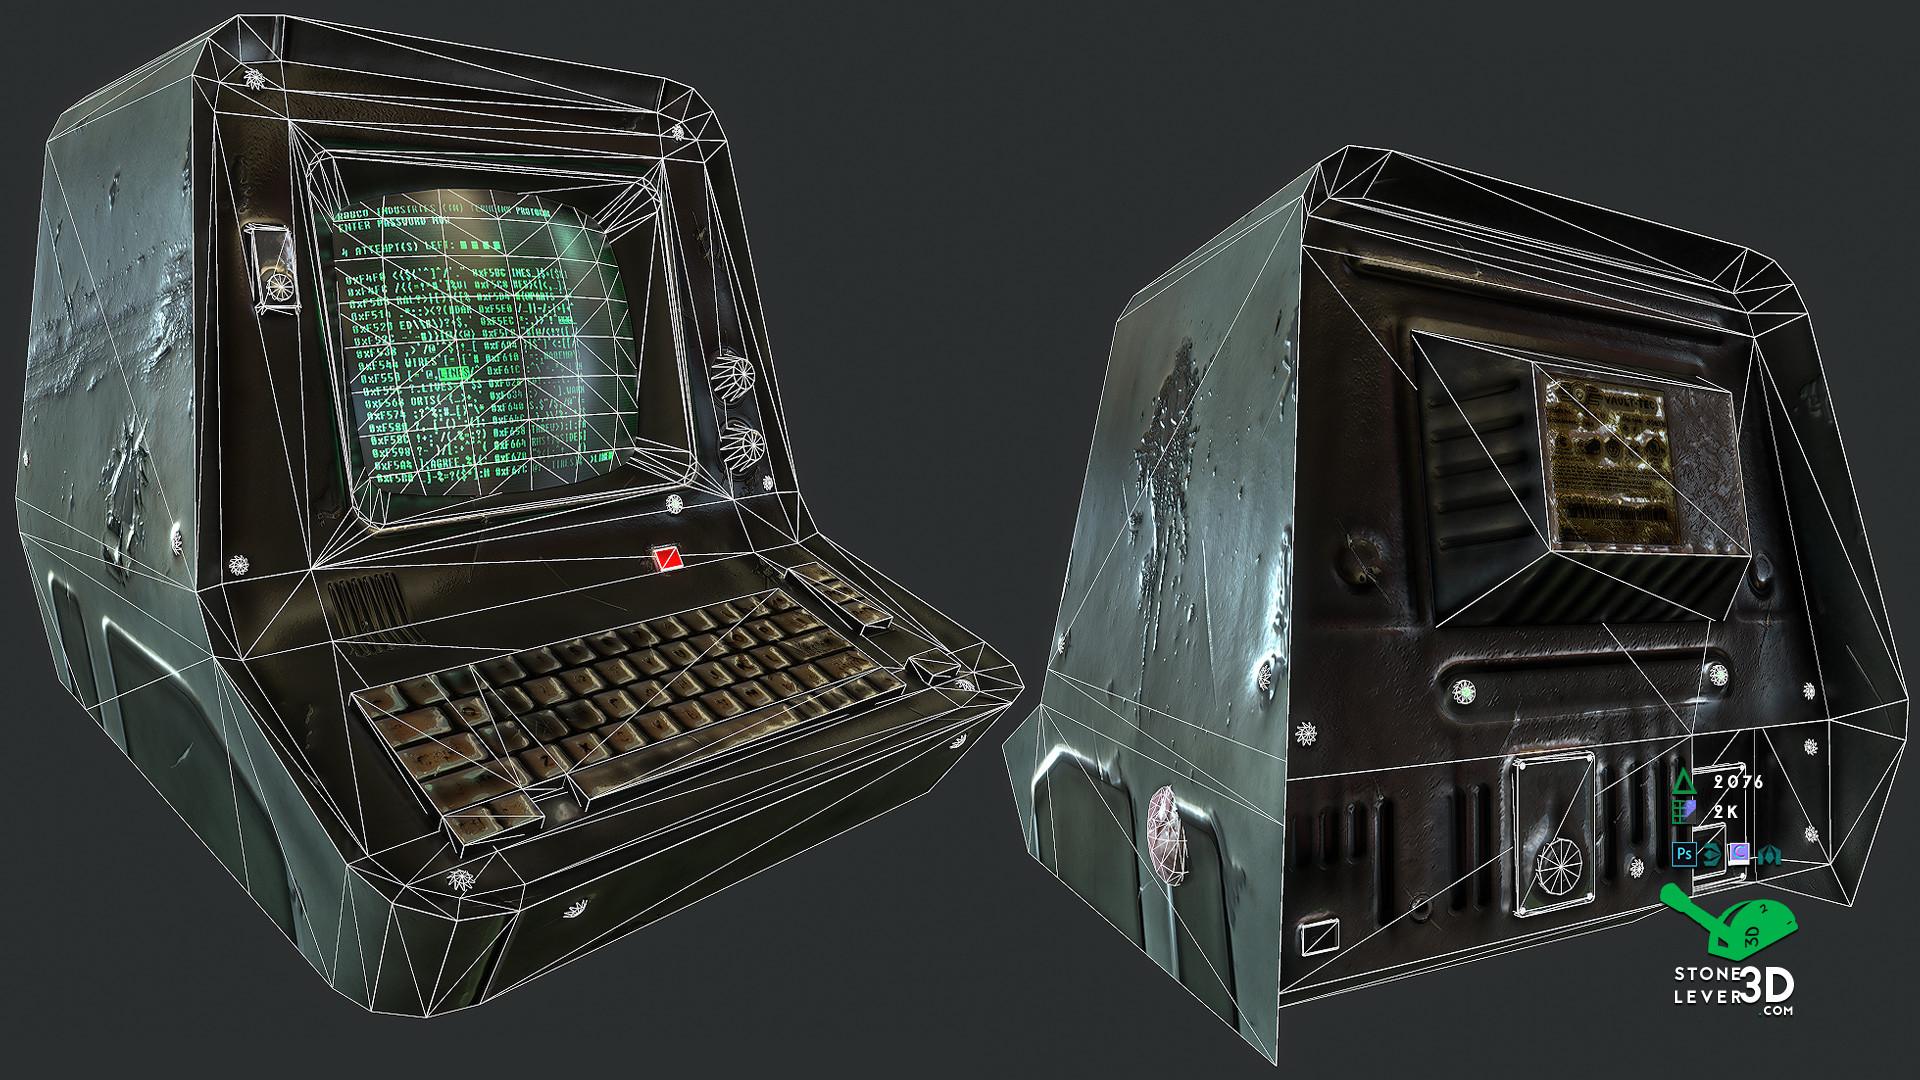 """PC Terminal"" Prop Model Replica - Wireframe"